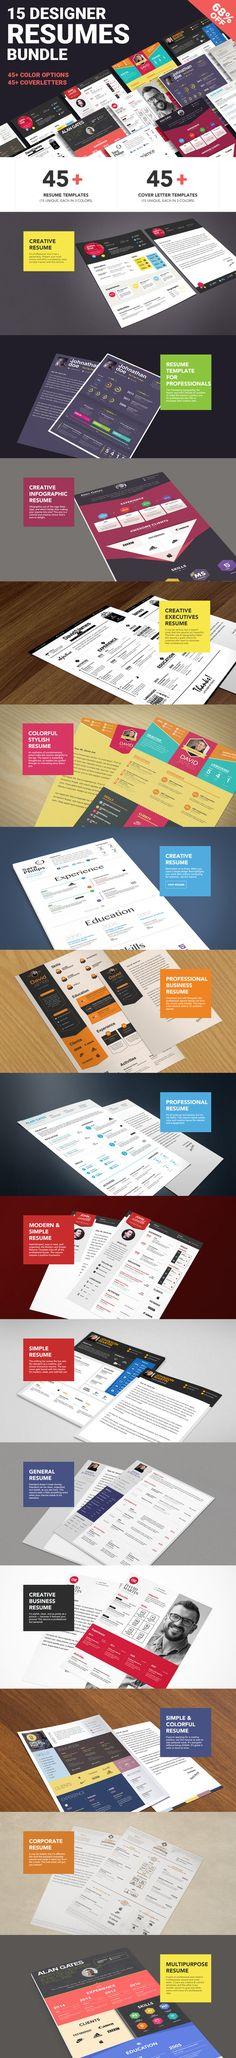 Massive Designer Resumes Bundle by ZippyPixels on @creativework247